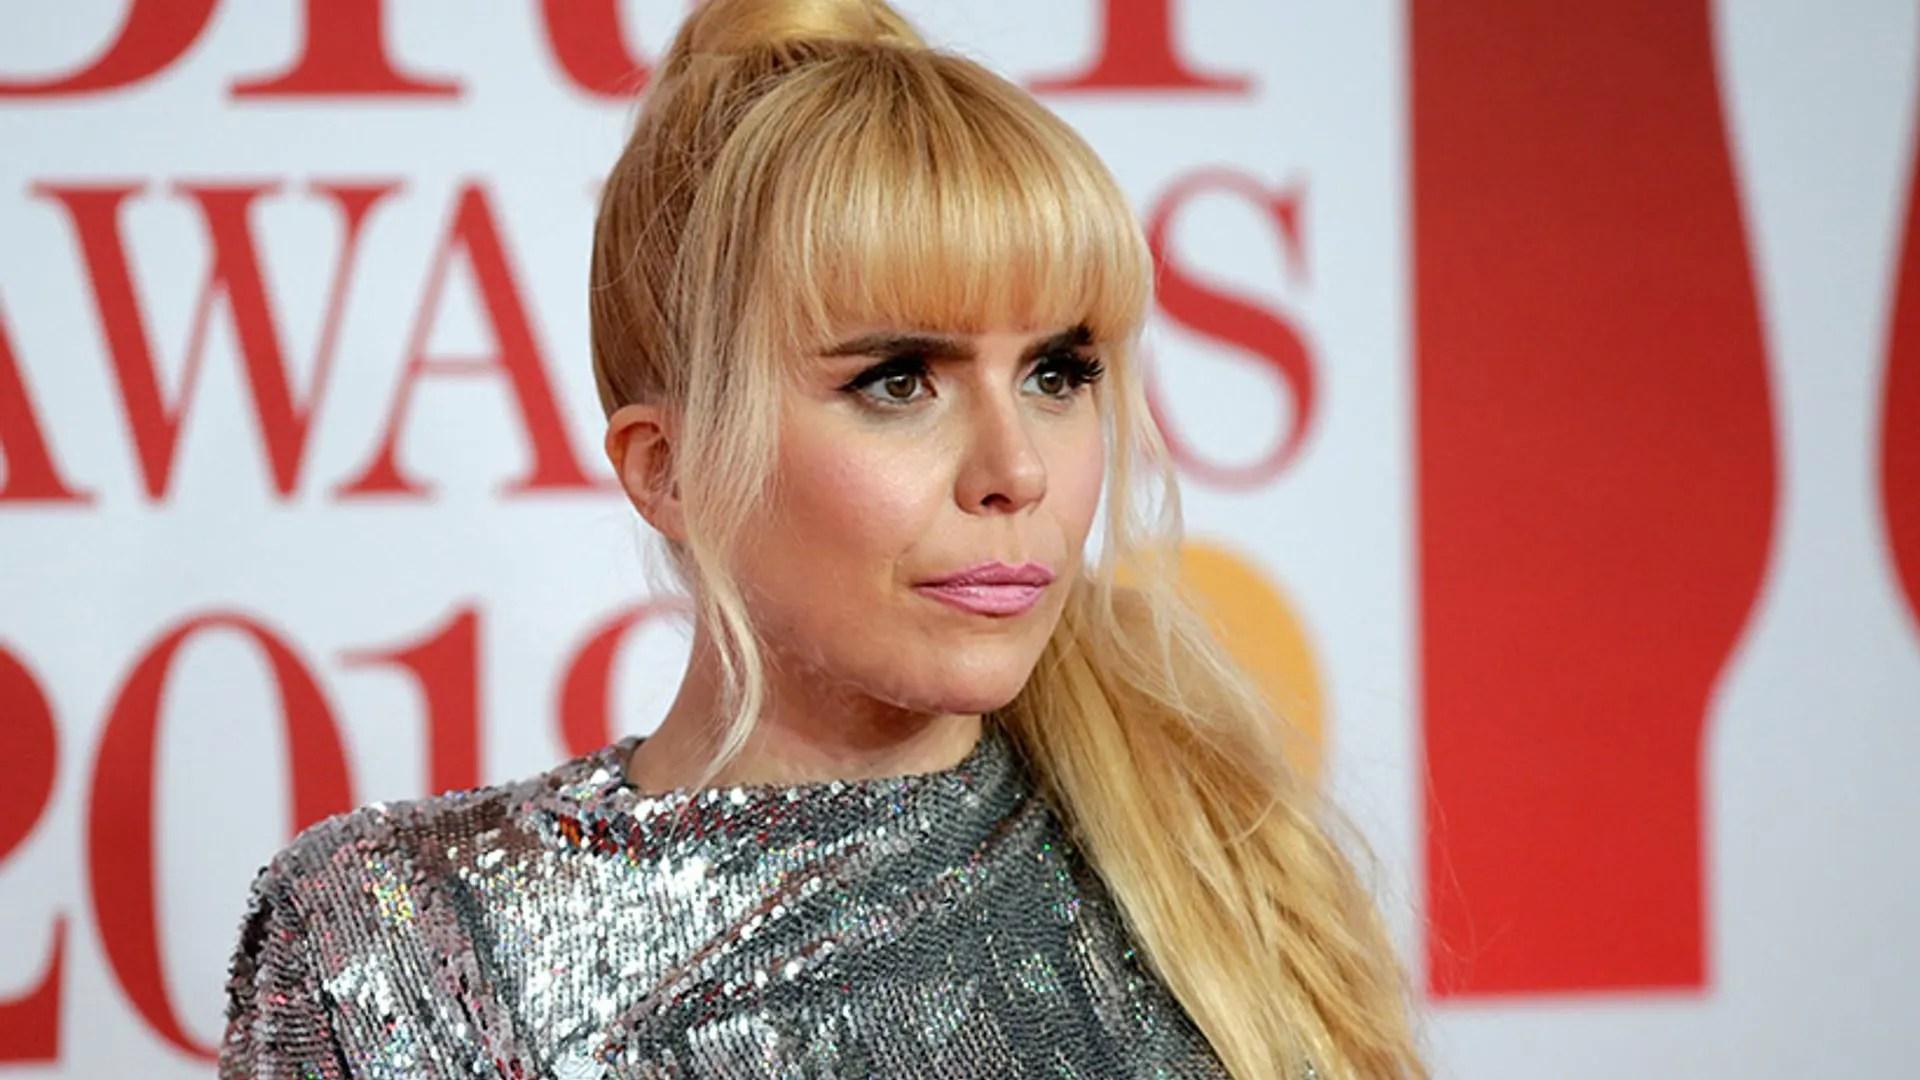 Paloma Faiths New Blonde Hair Transformation Is So Dramatic